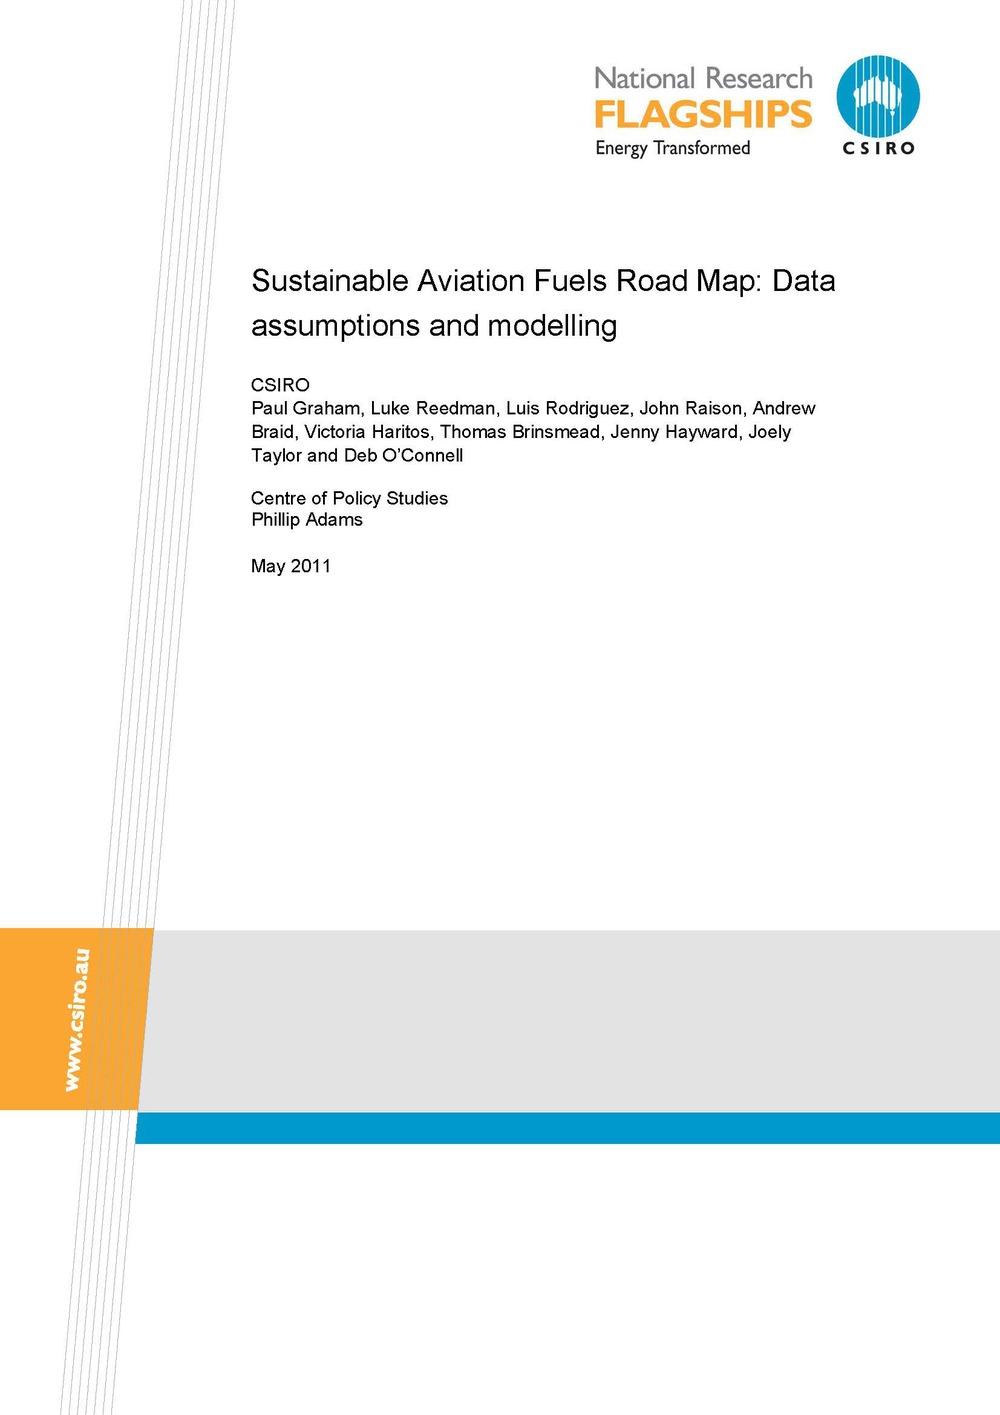 SustAviationFuelsRoadMap_ETF_pdf Standard 1.jpg